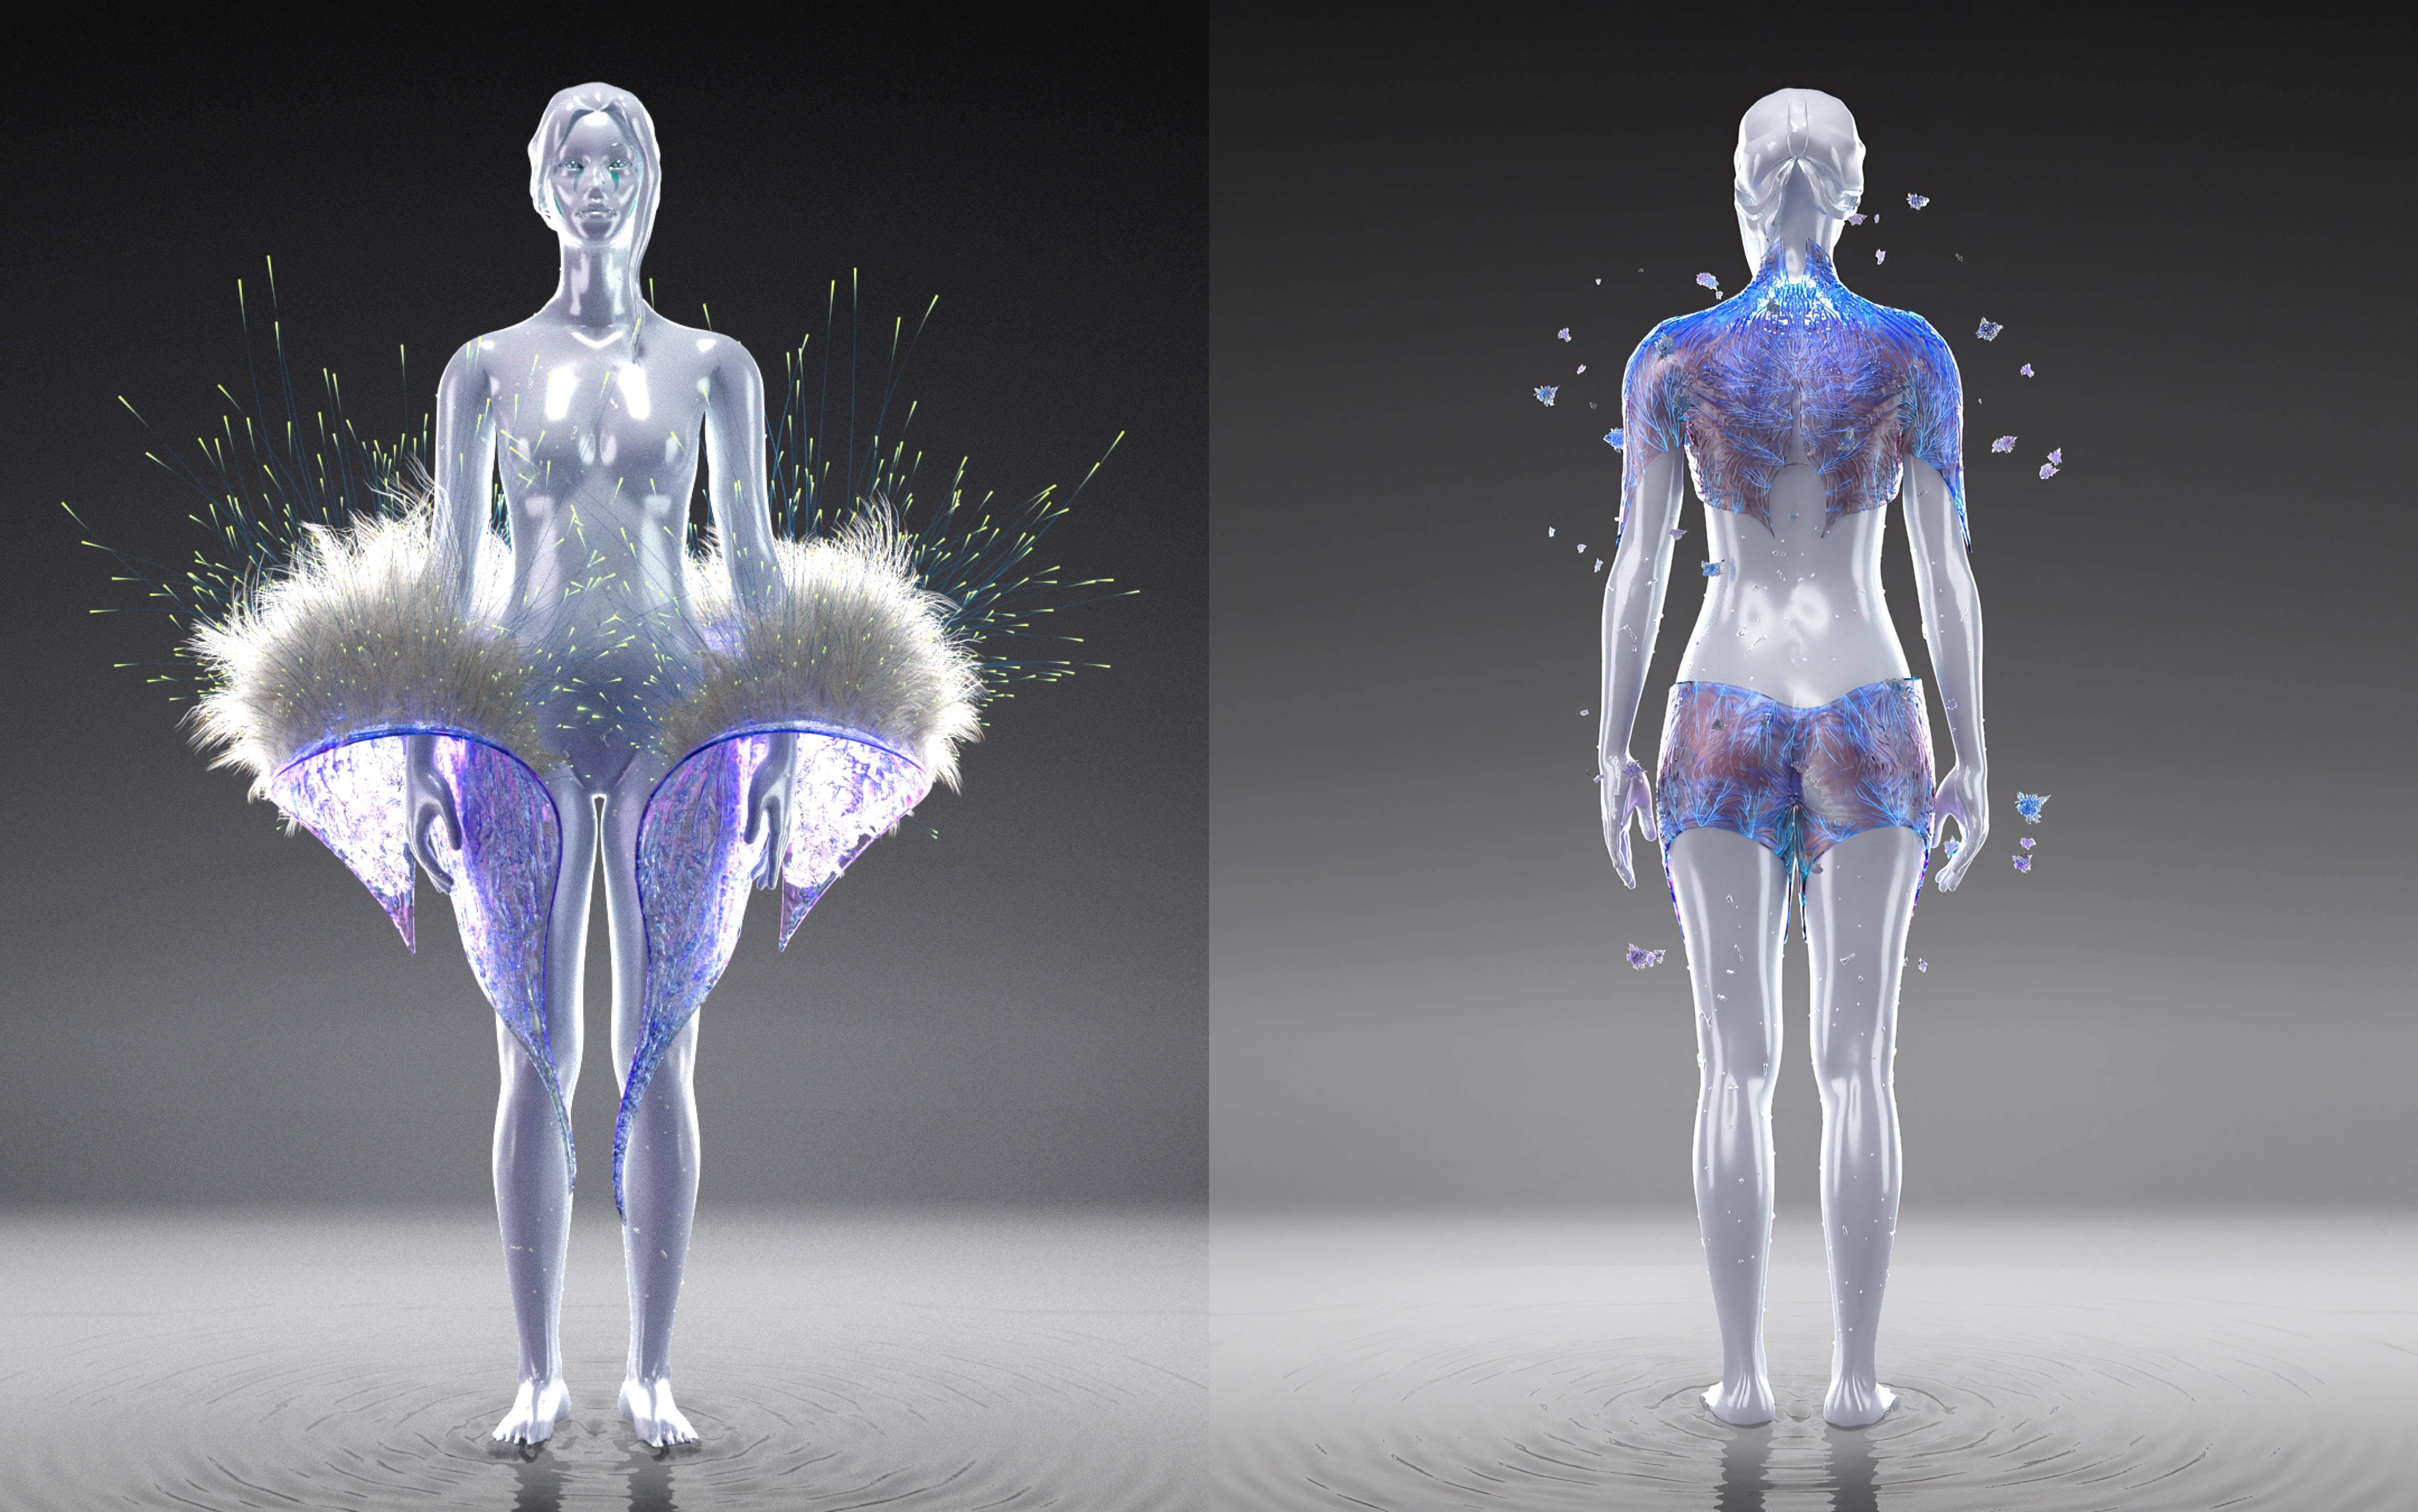 Auroboros' biomimicry designs